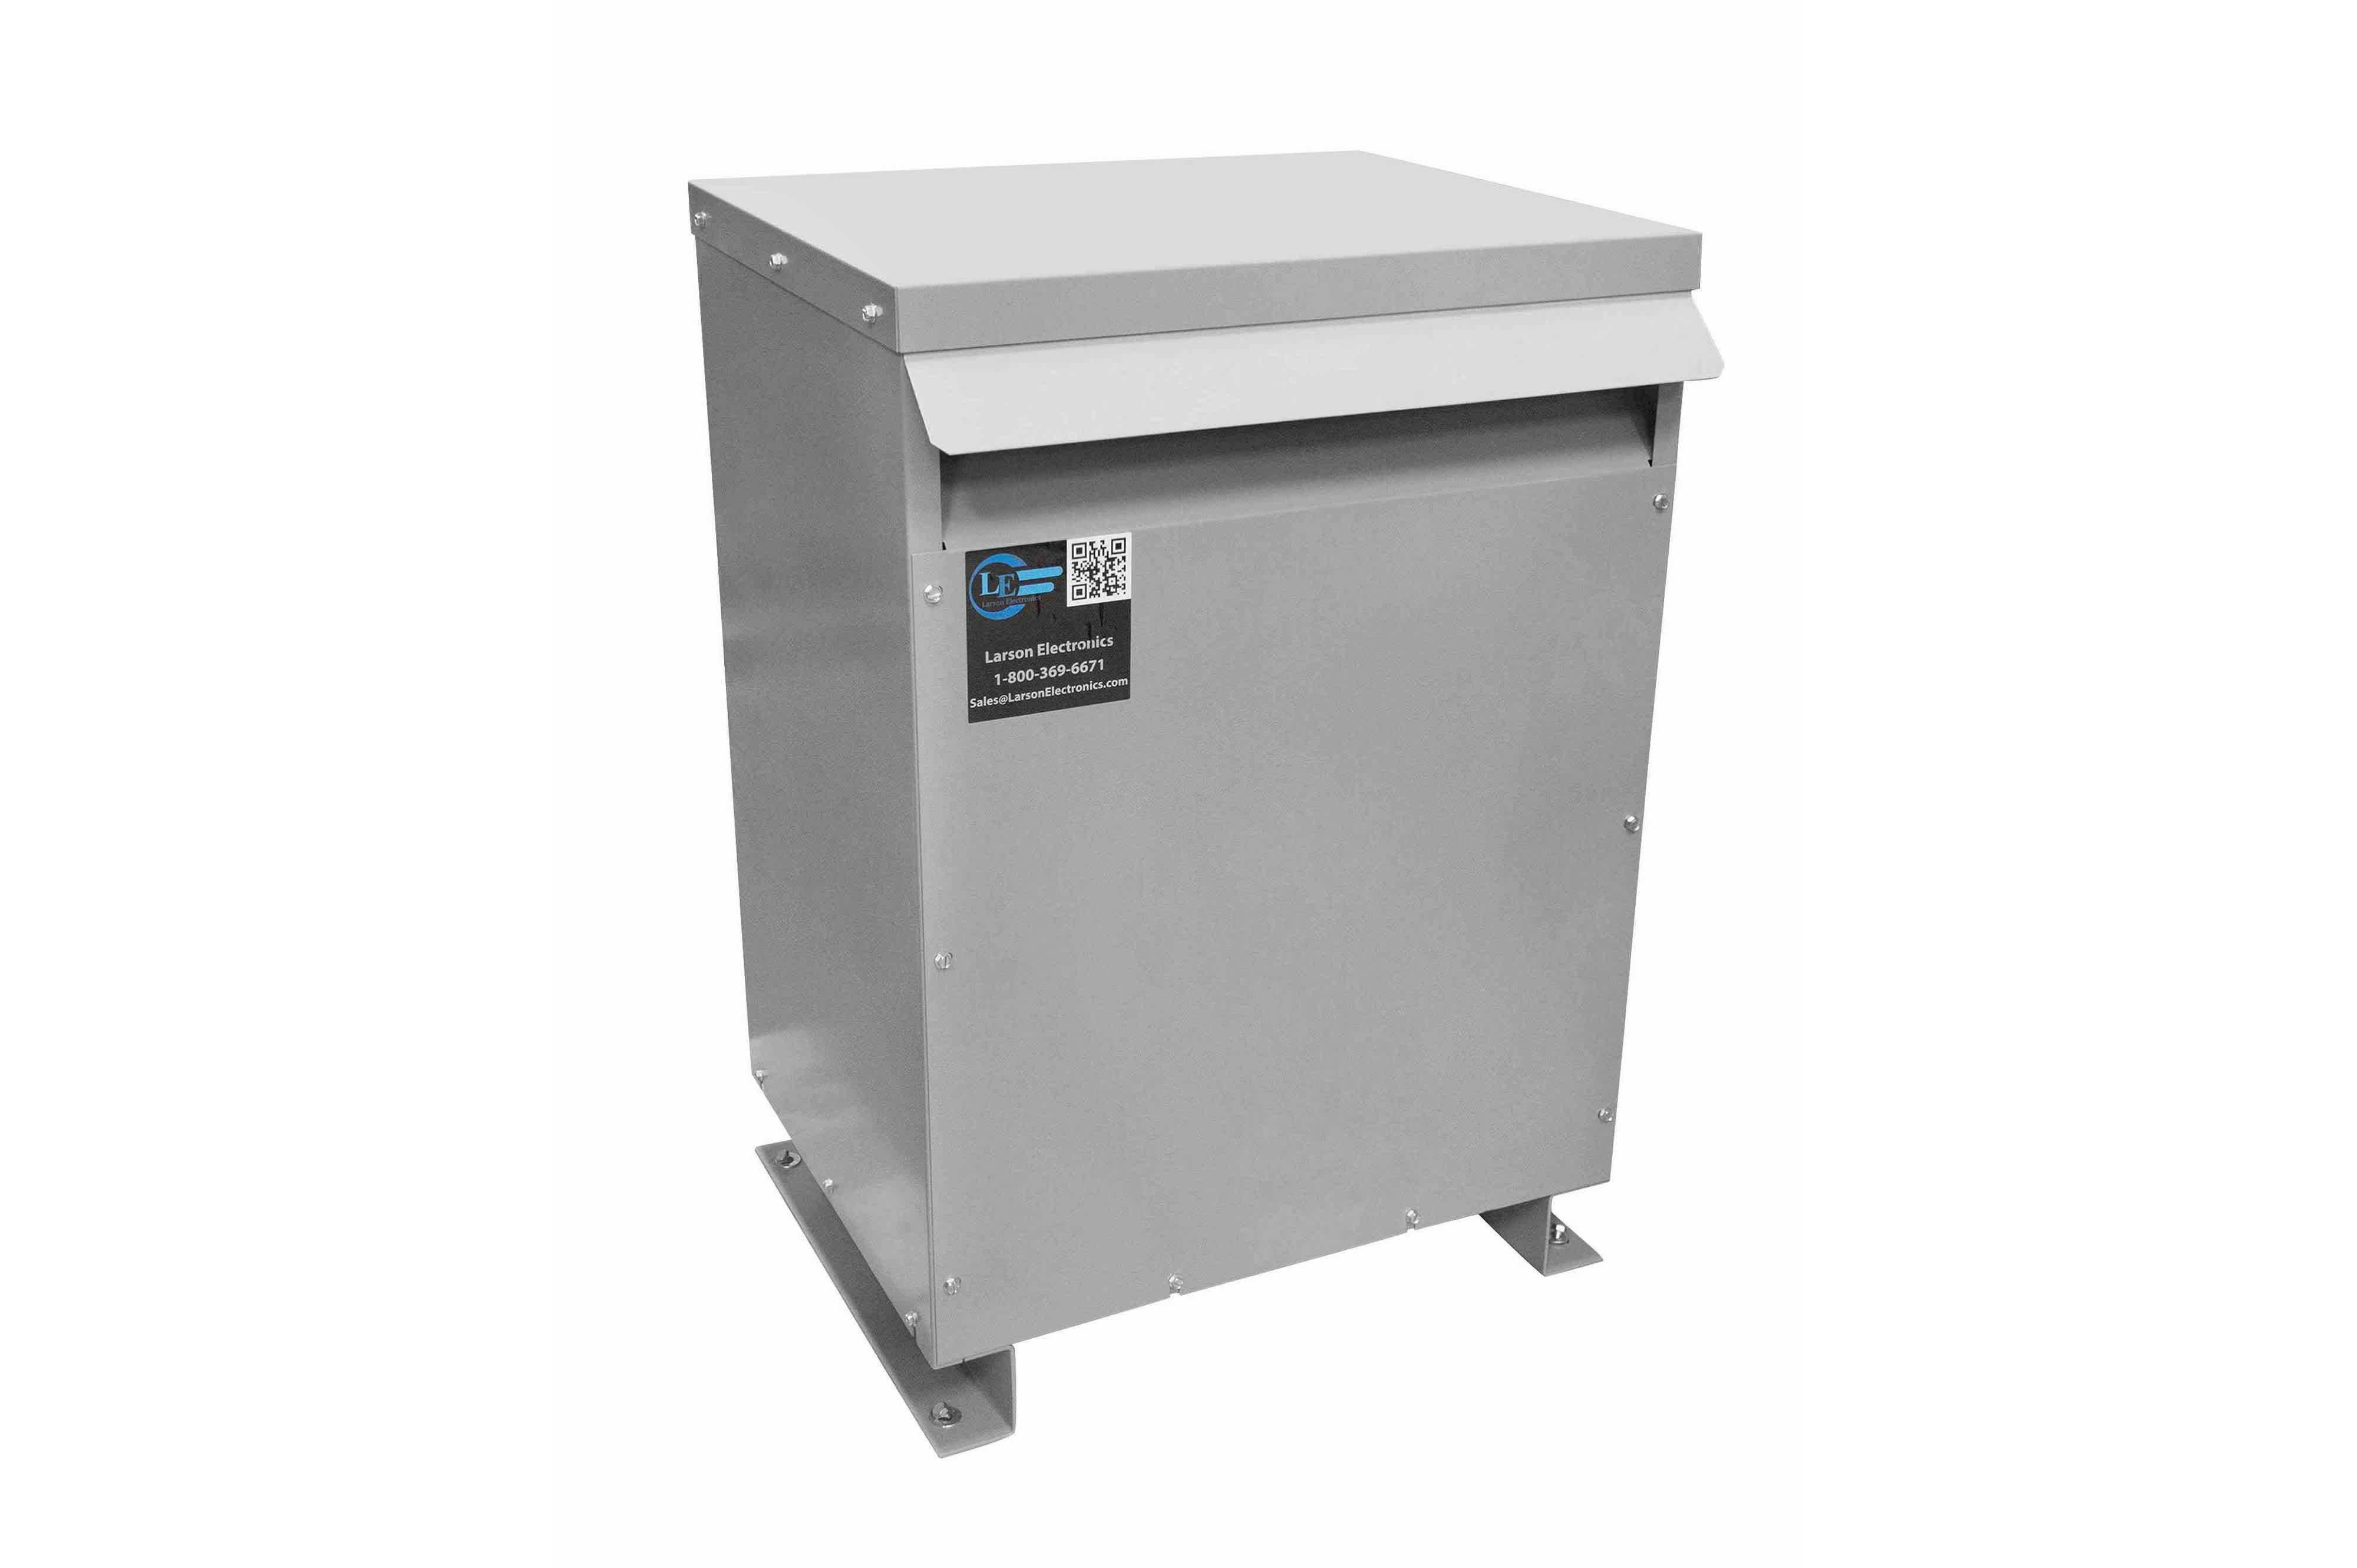 90 kVA 3PH Isolation Transformer, 208V Wye Primary, 208Y/120 Wye-N Secondary, N3R, Ventilated, 60 Hz